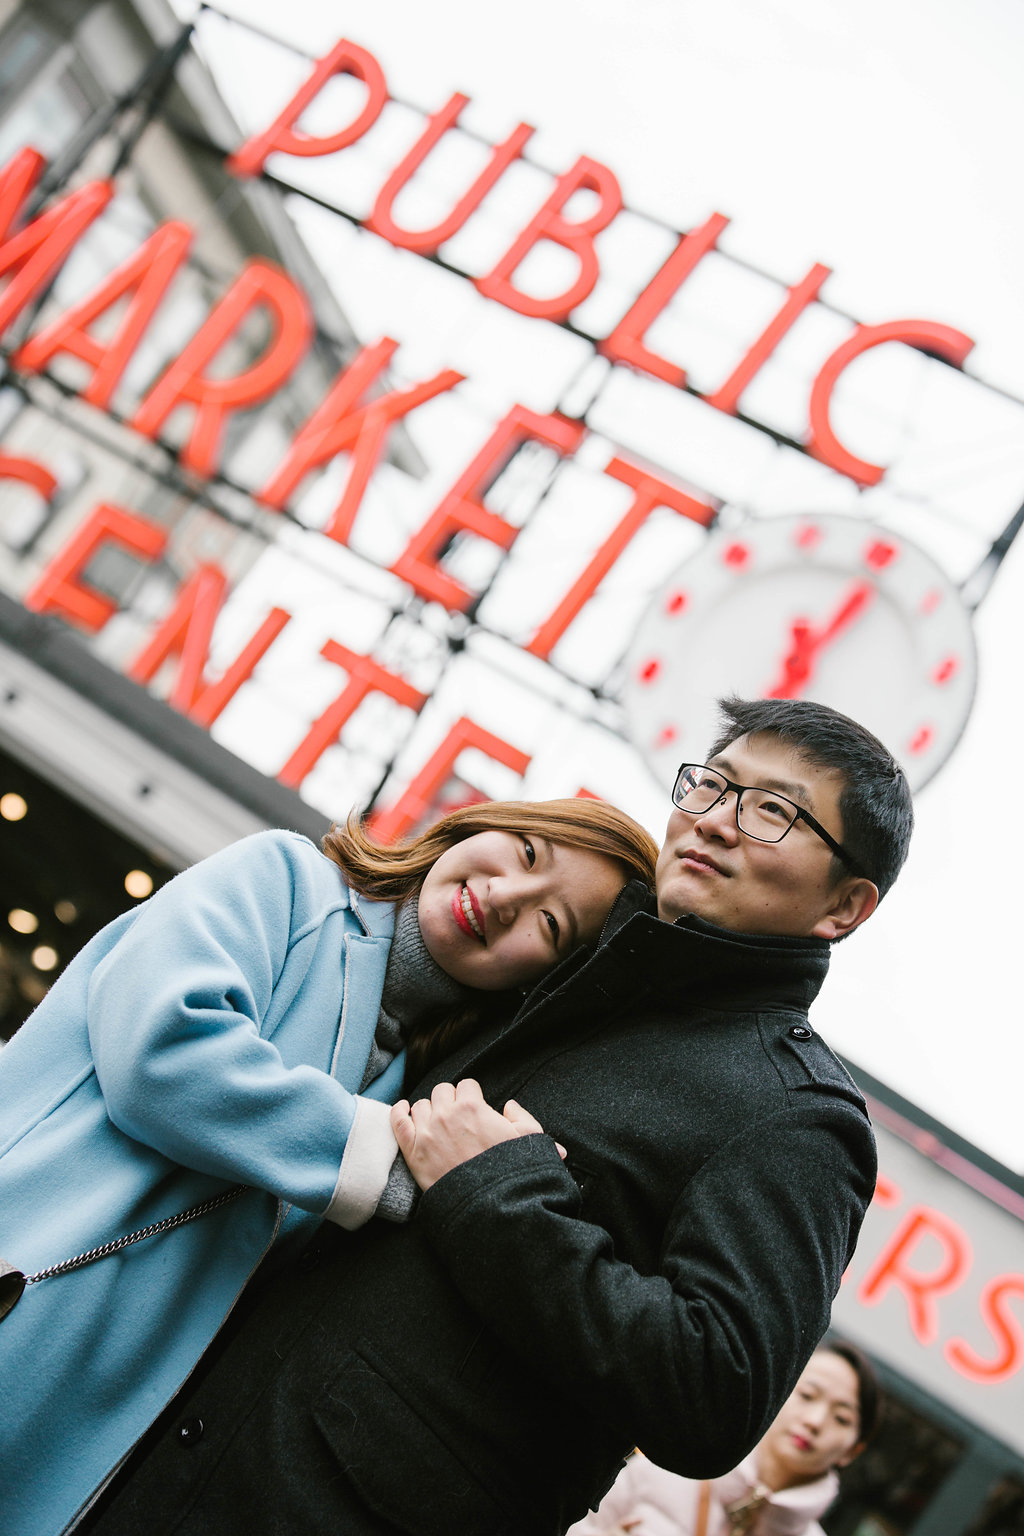 Qian+Jacson_best+Seattle+wedding+Photographer_APW52.JPG